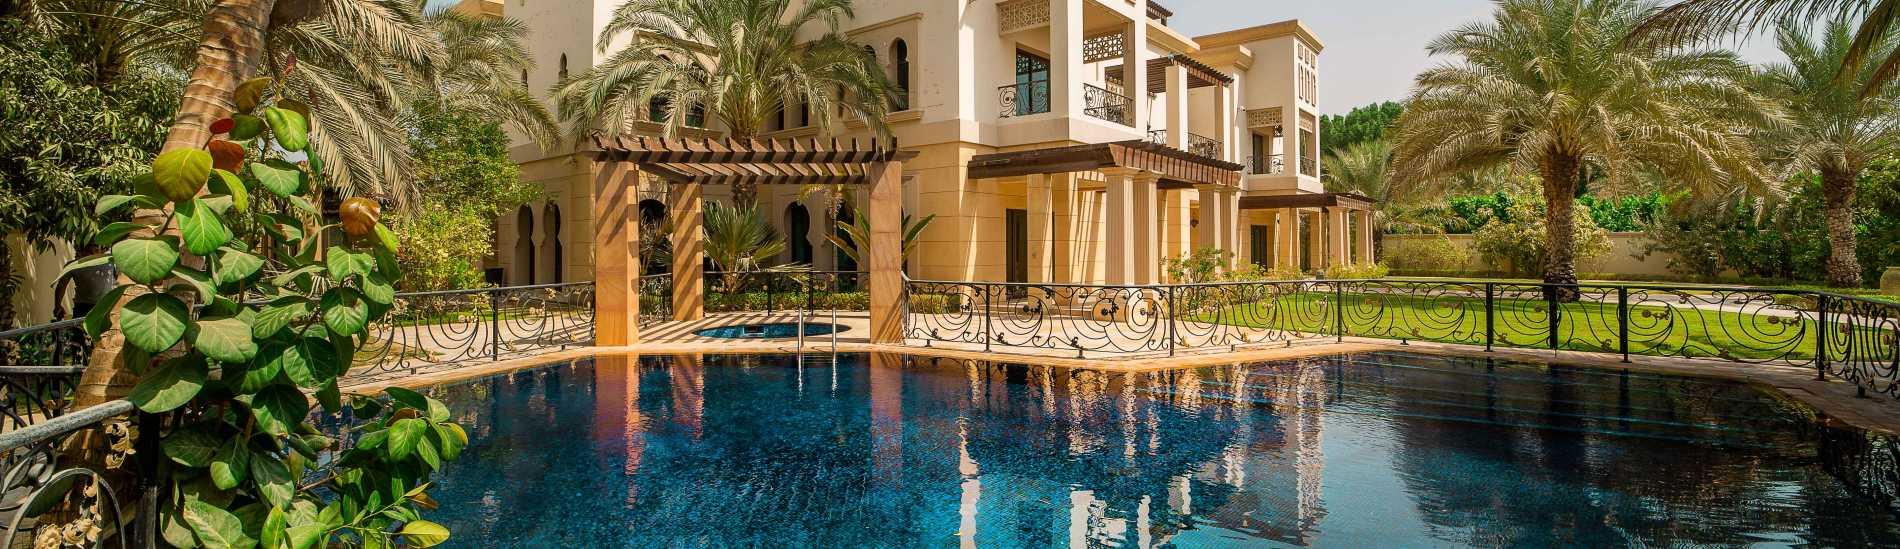 5 Finest Dubai Mansions in 2019